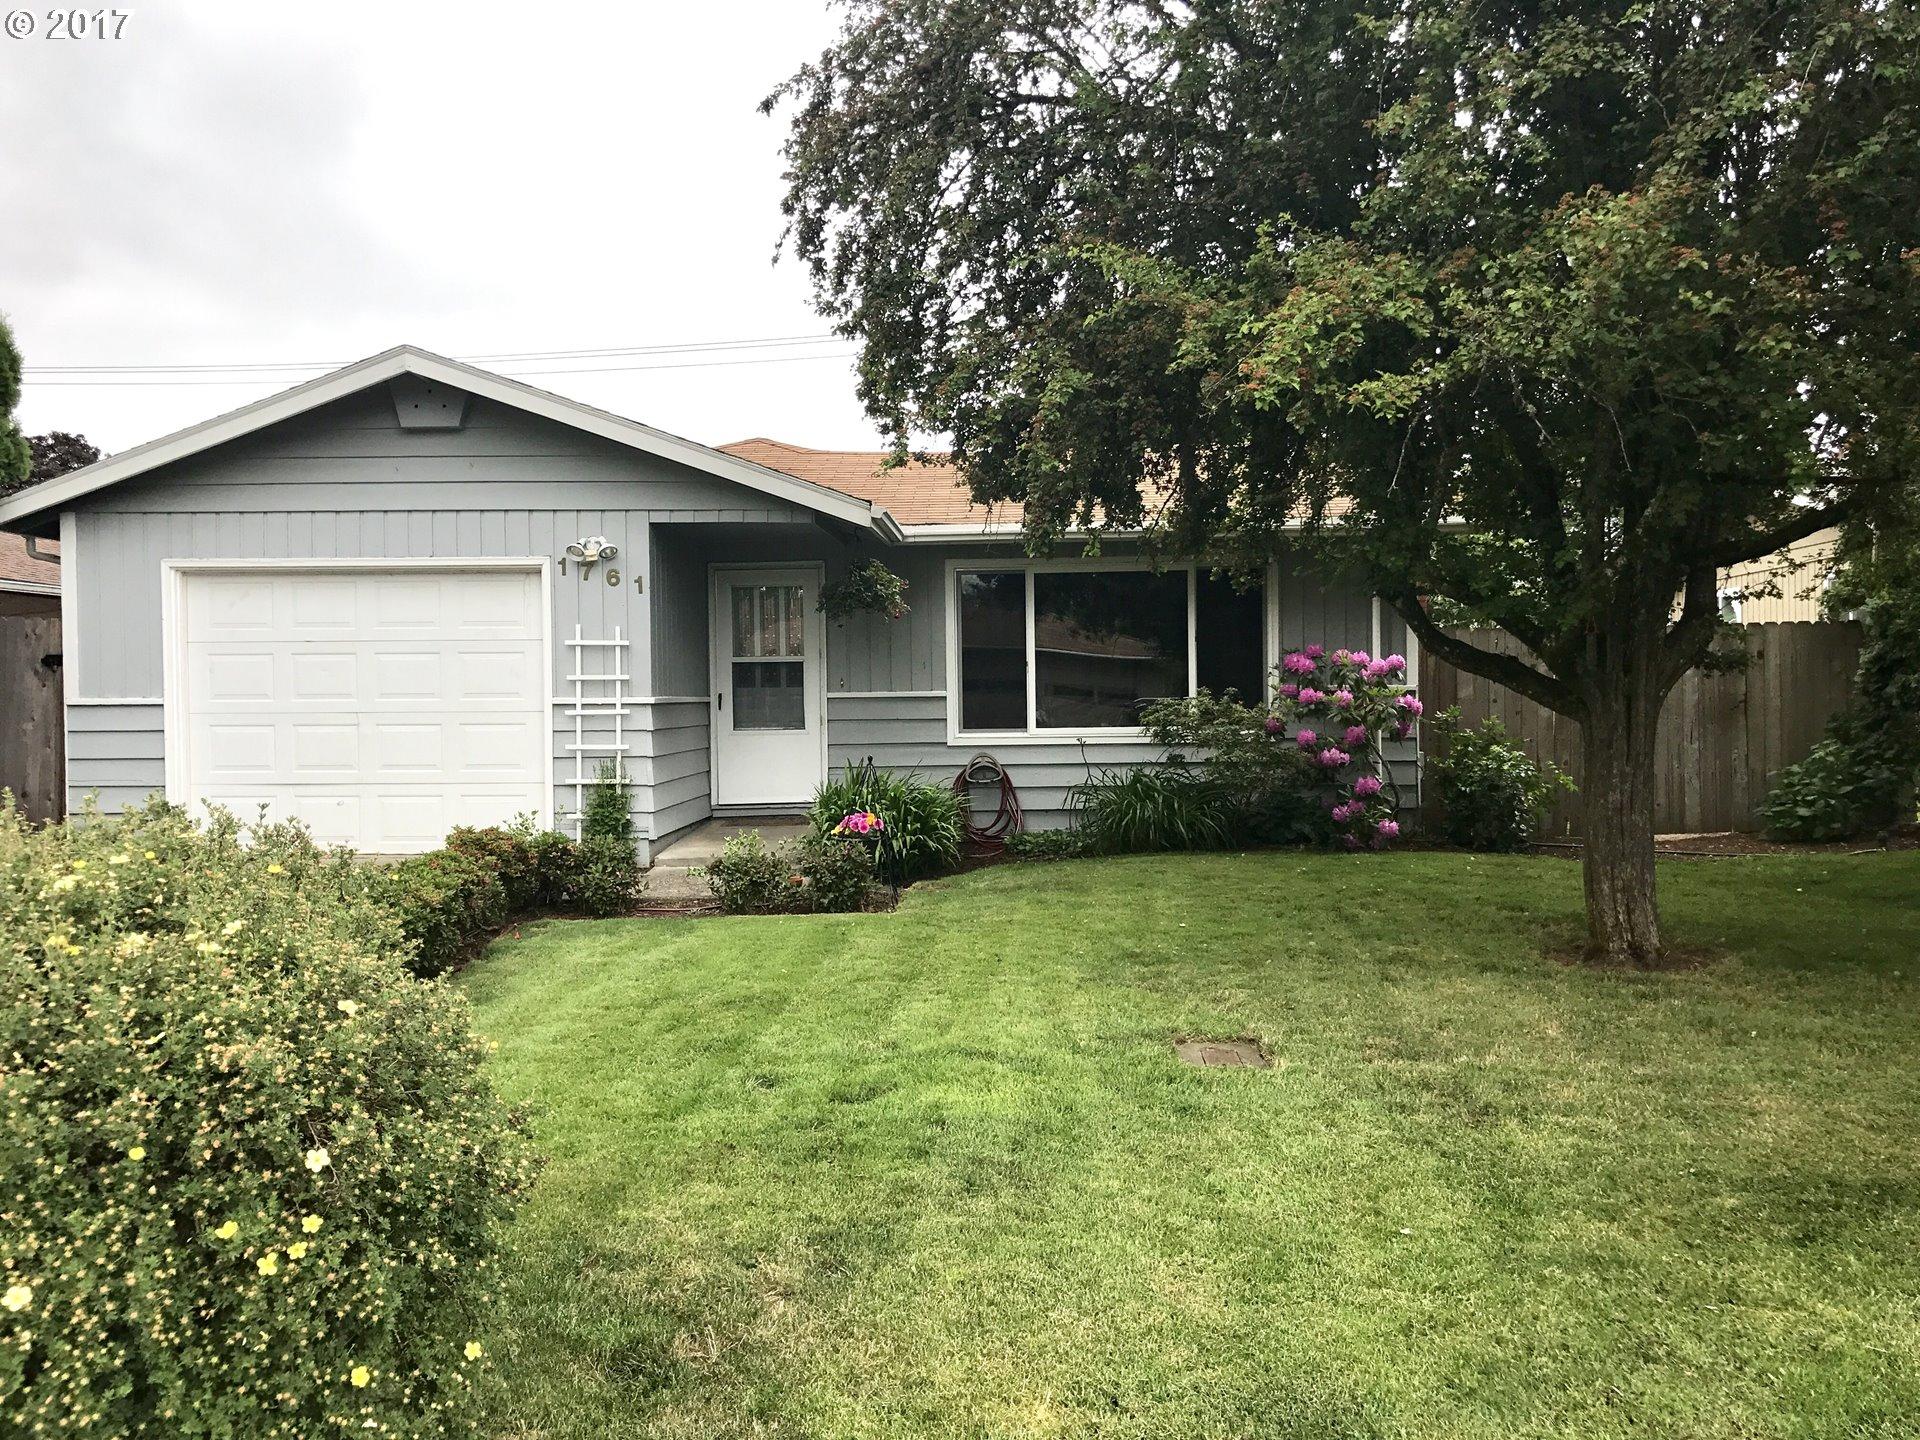 1761 BERWIN LN, Eugene, OR 97404